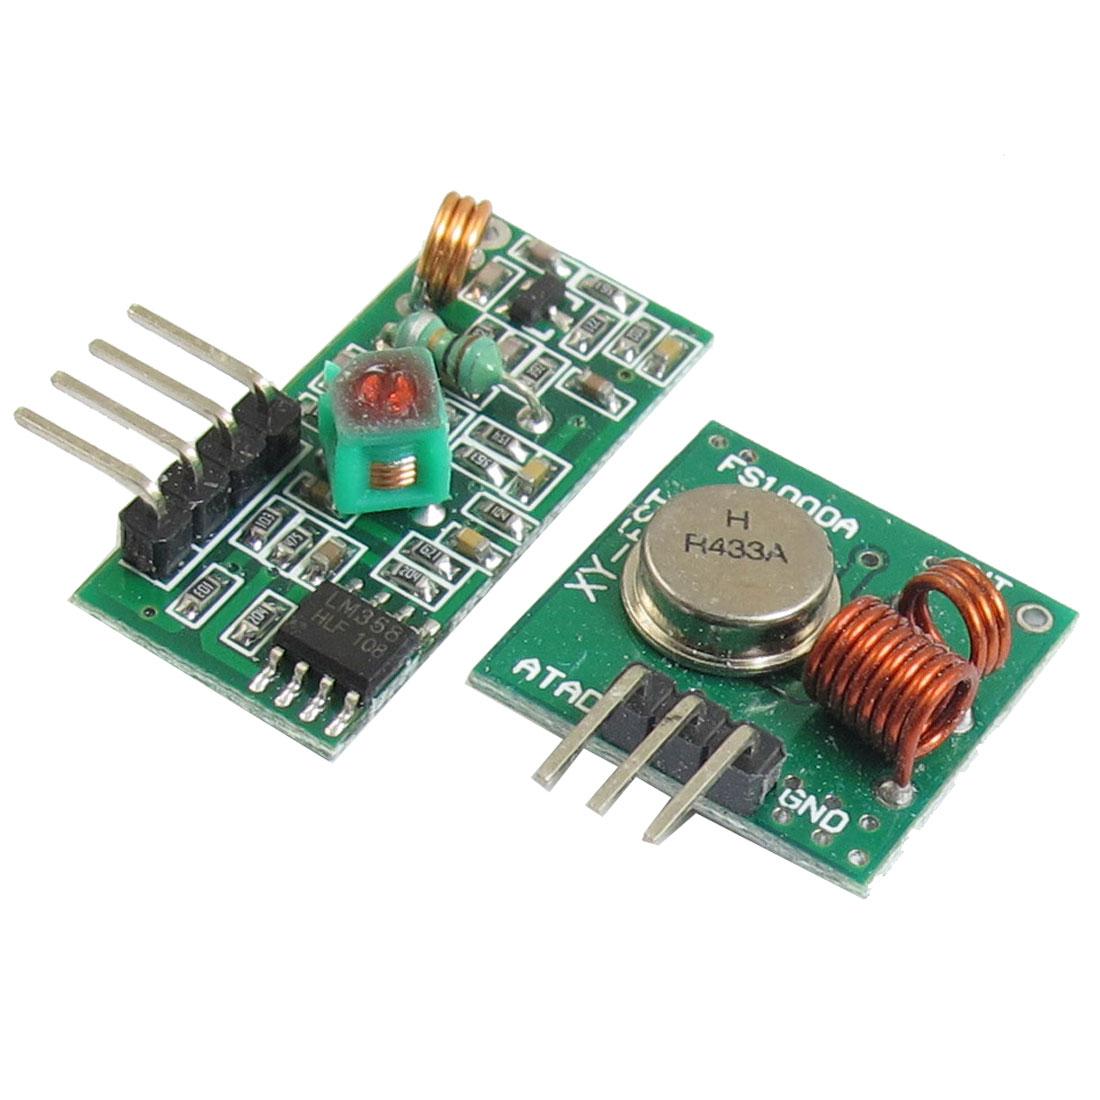 DC 3-12V 10-15mA AM 10mW Remote Control Wireless Send Module 433M